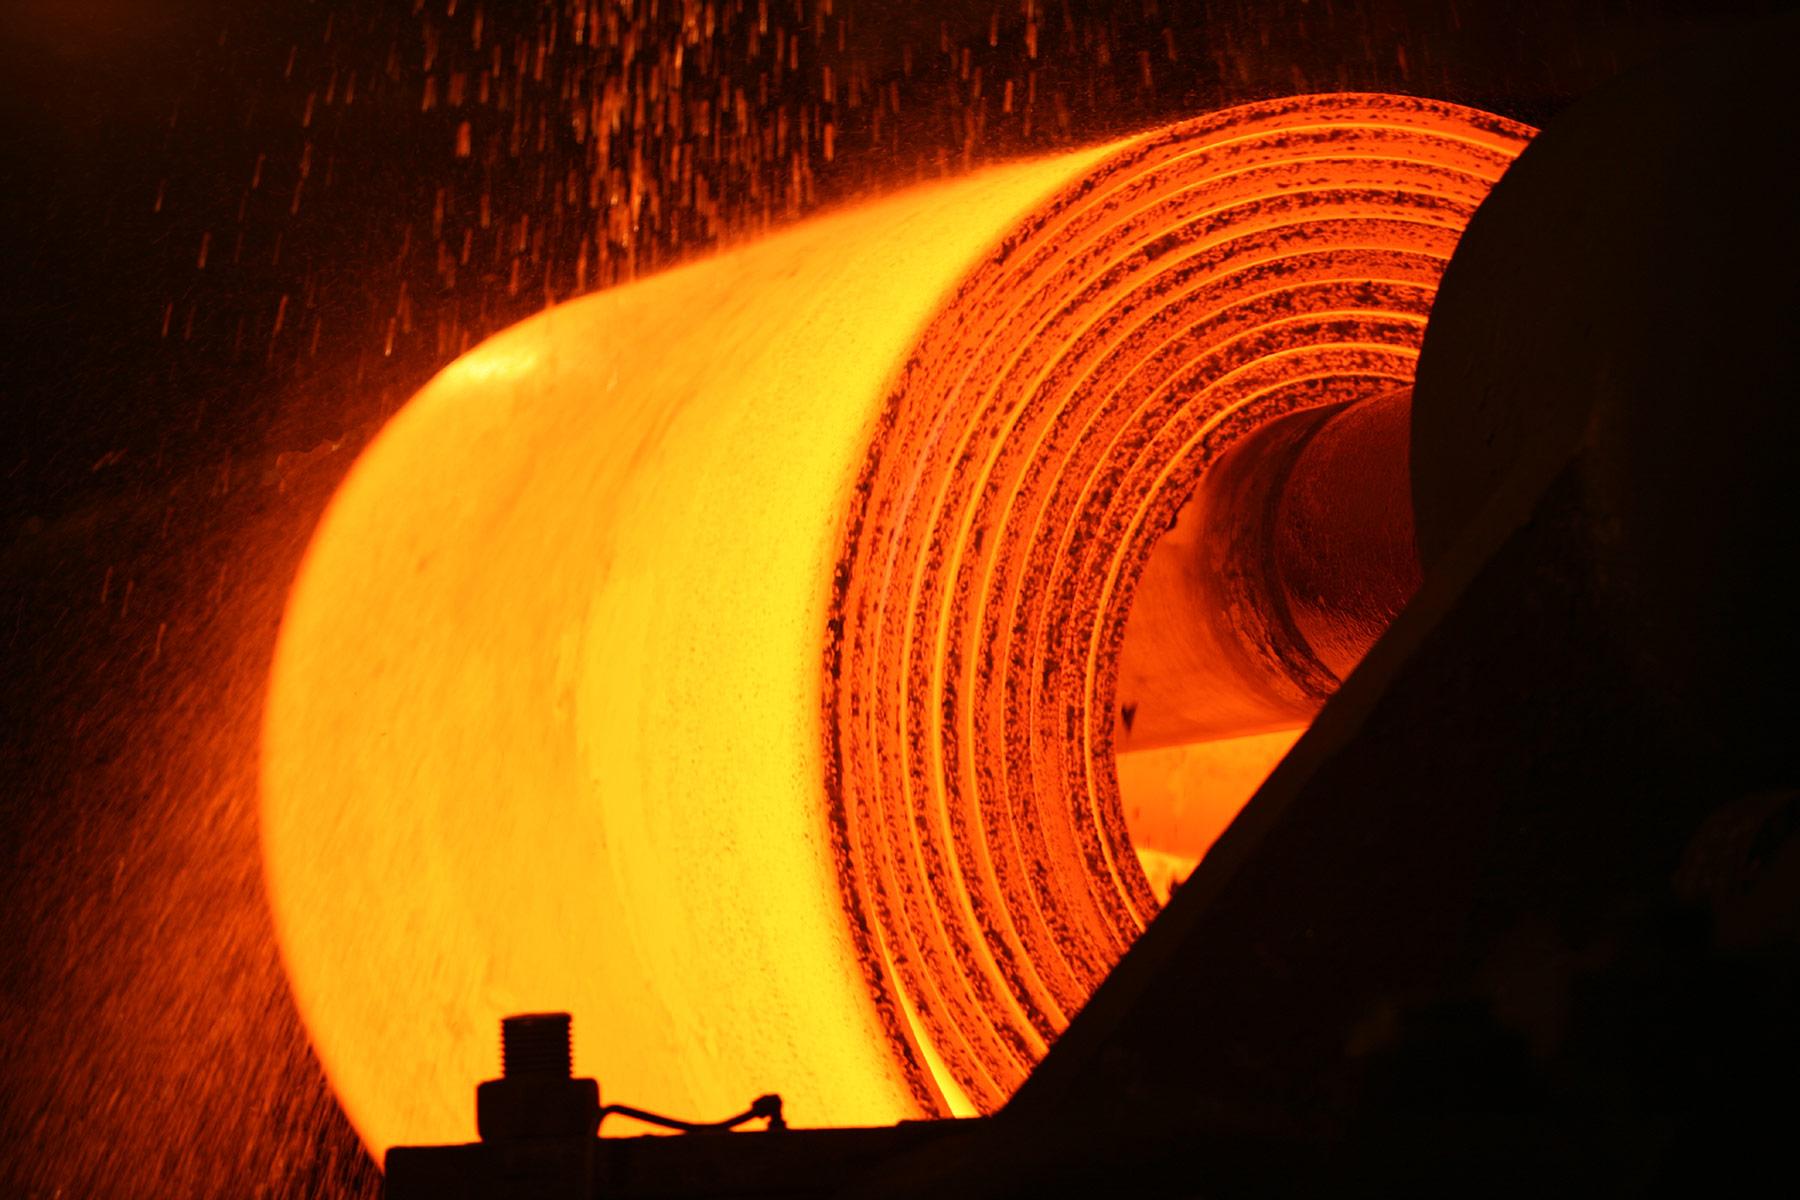 Corus / Tata Steel Europe Rolling Hot Mill / Push4